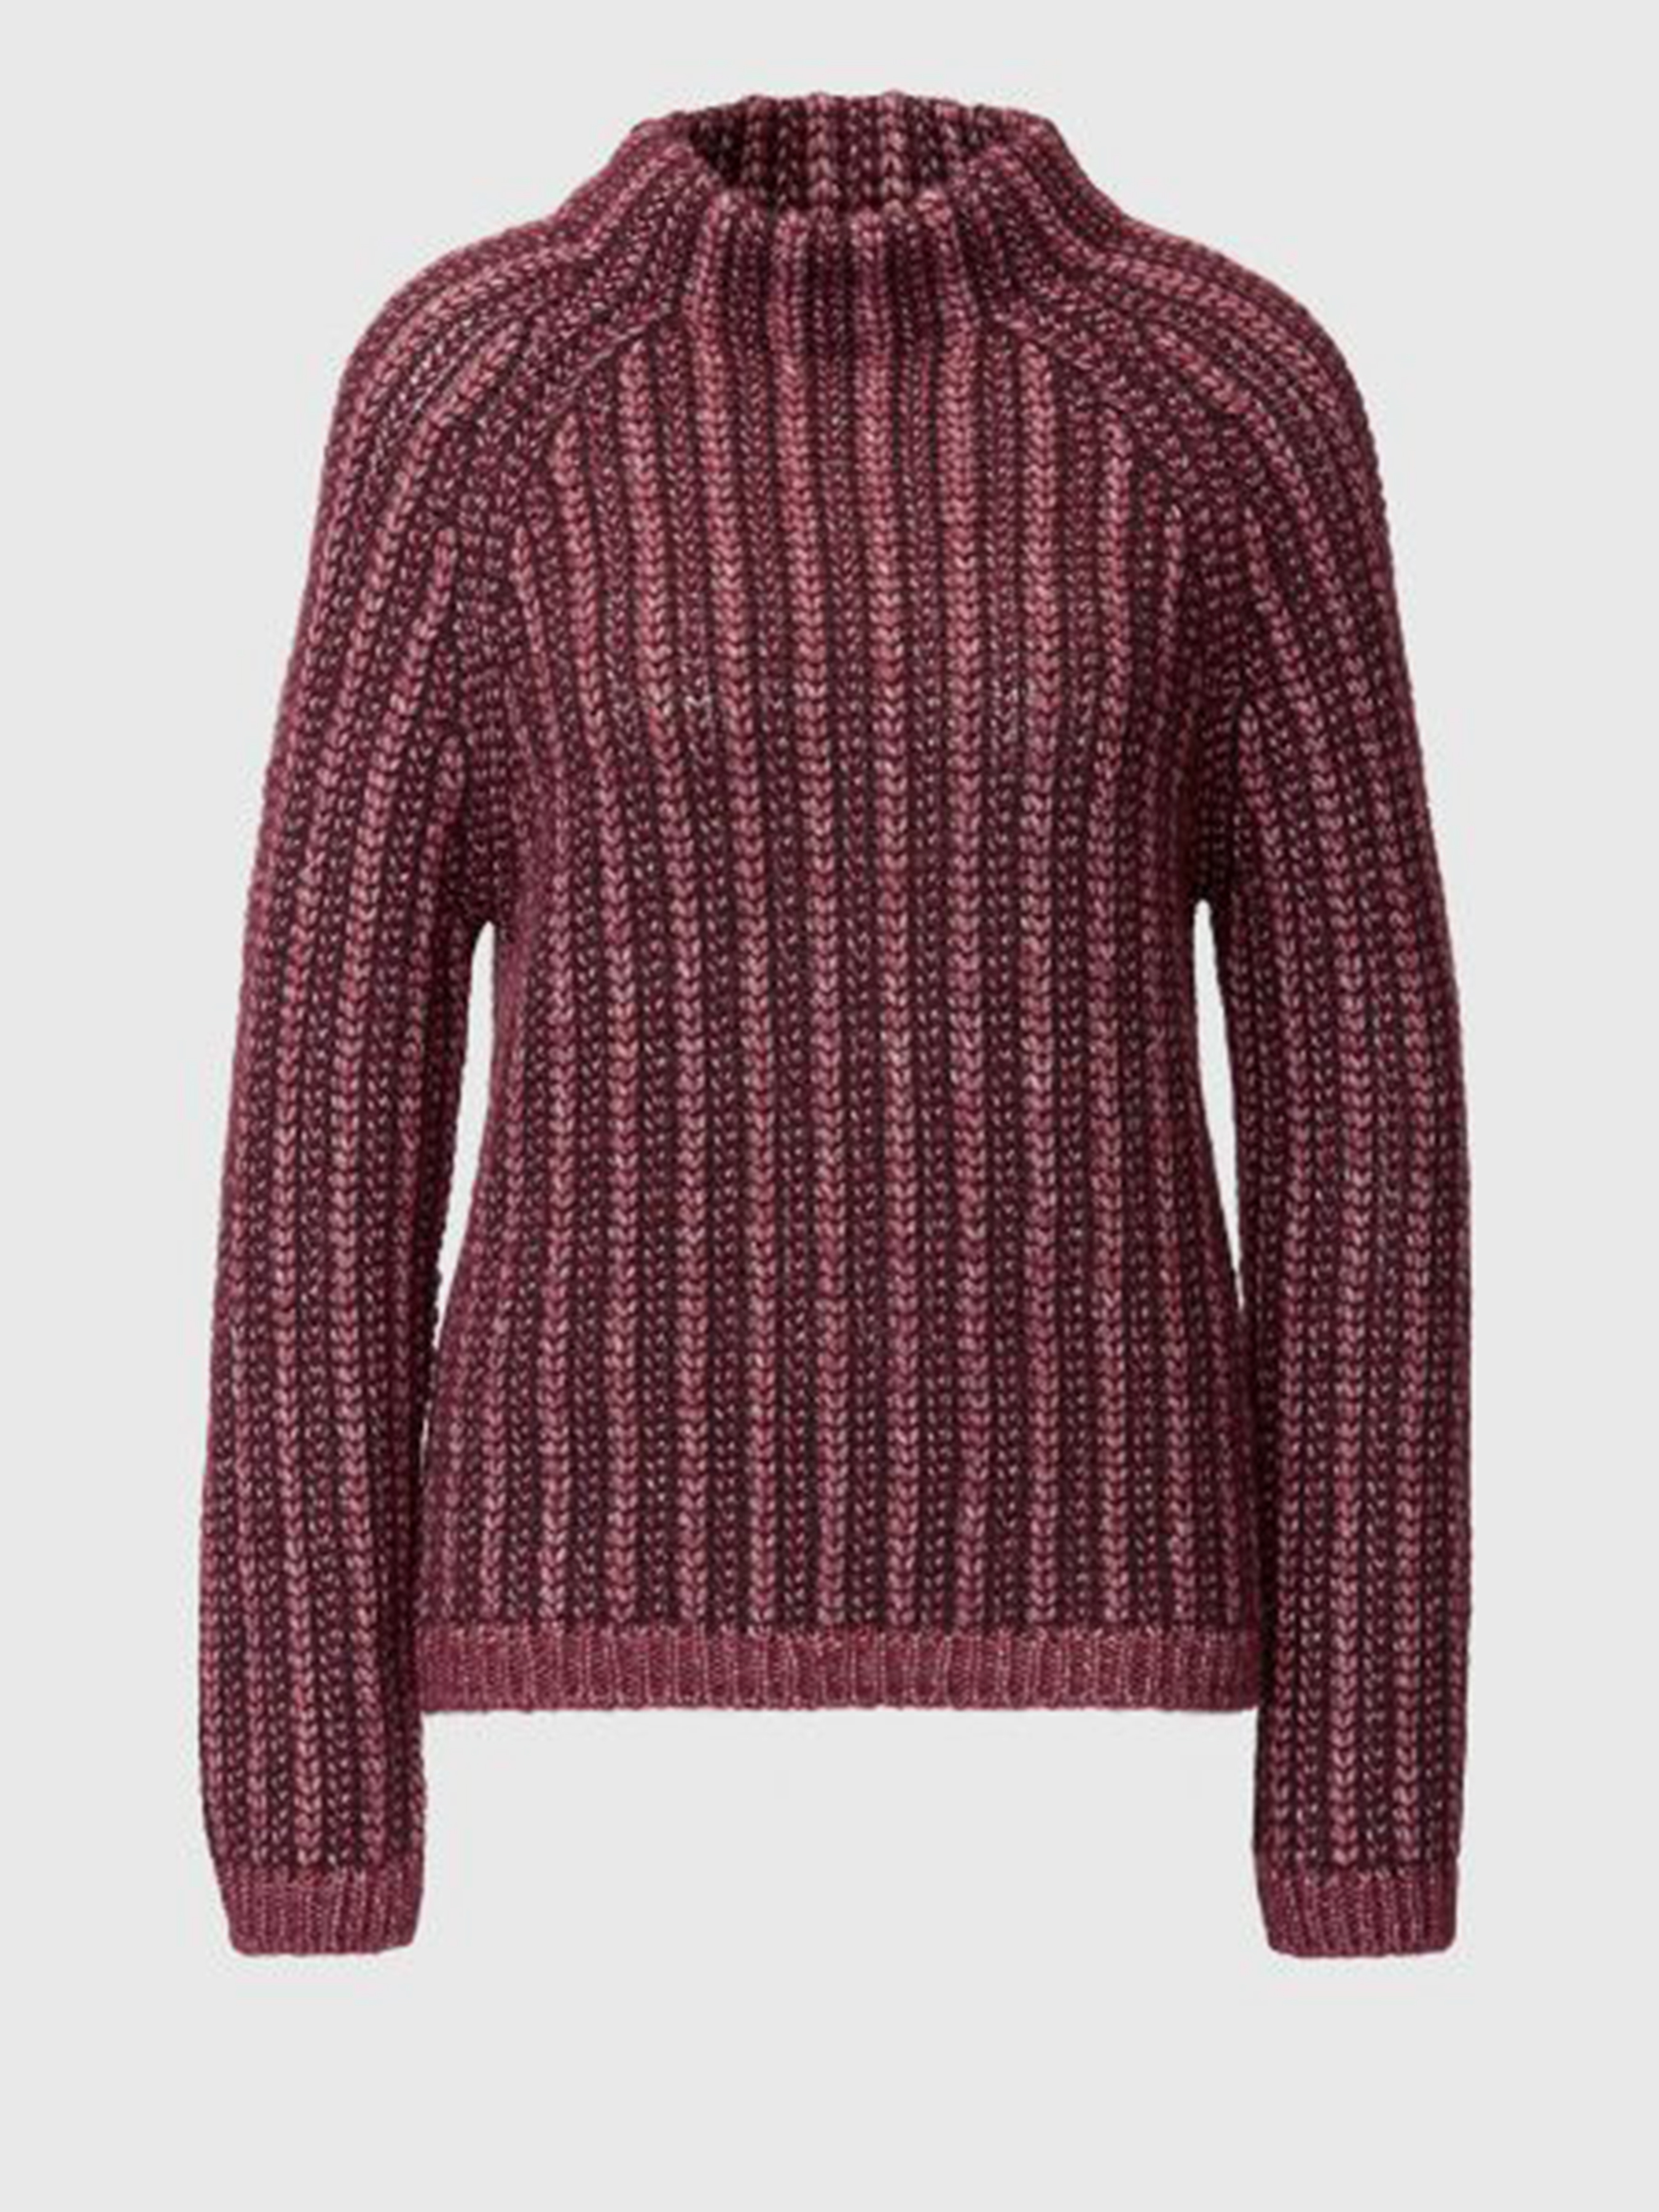 Кофты и свитера женские MARC O'POLO модель PF3869 характеристики, 2017